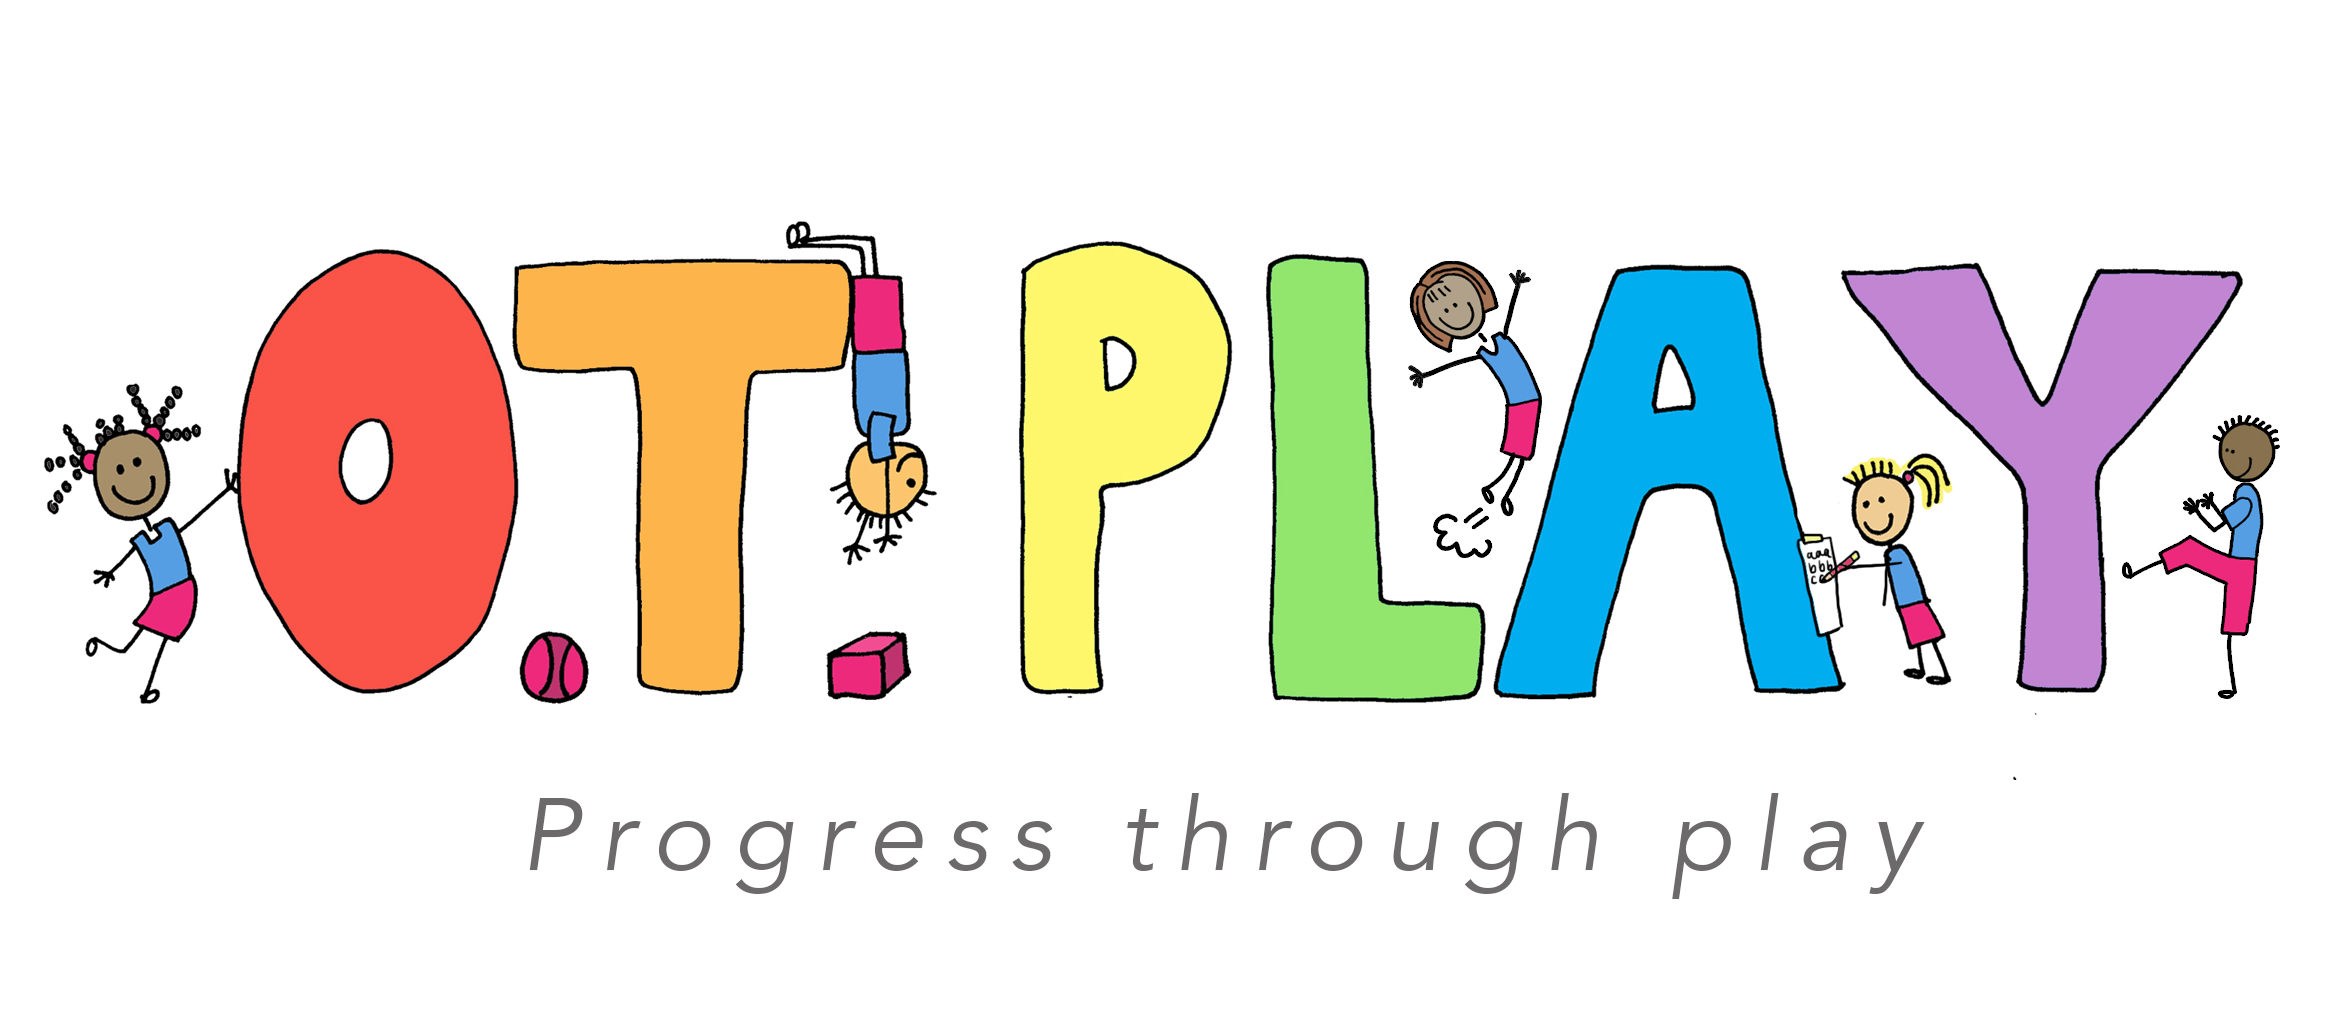 Progress Through Play